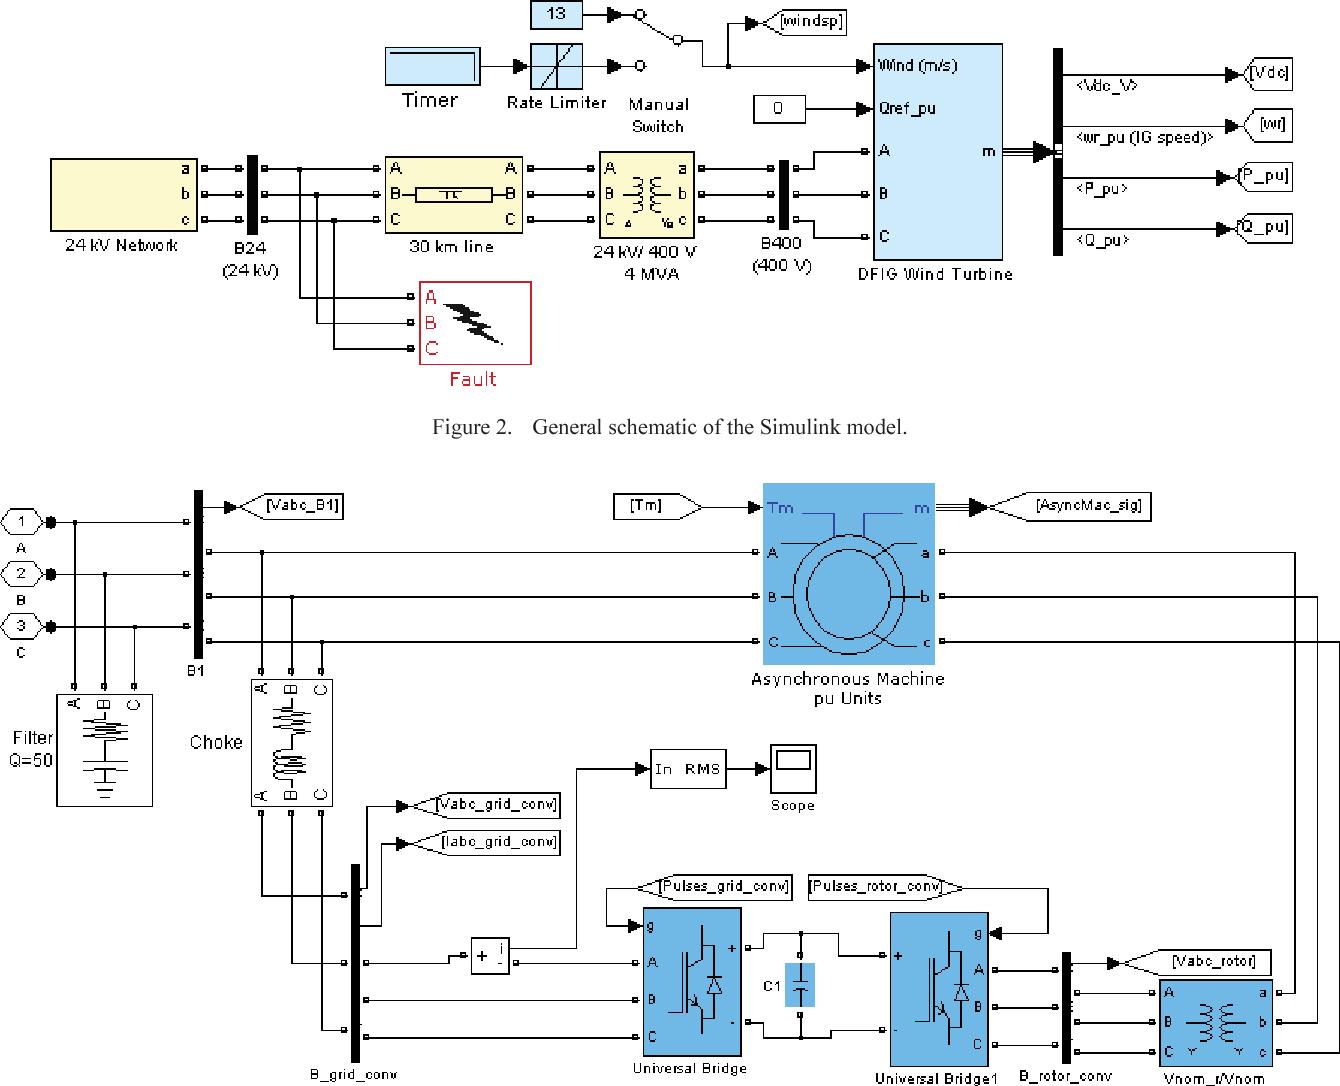 Simulation by MATLAB/Simulink of a wind farm power plant - Semantic